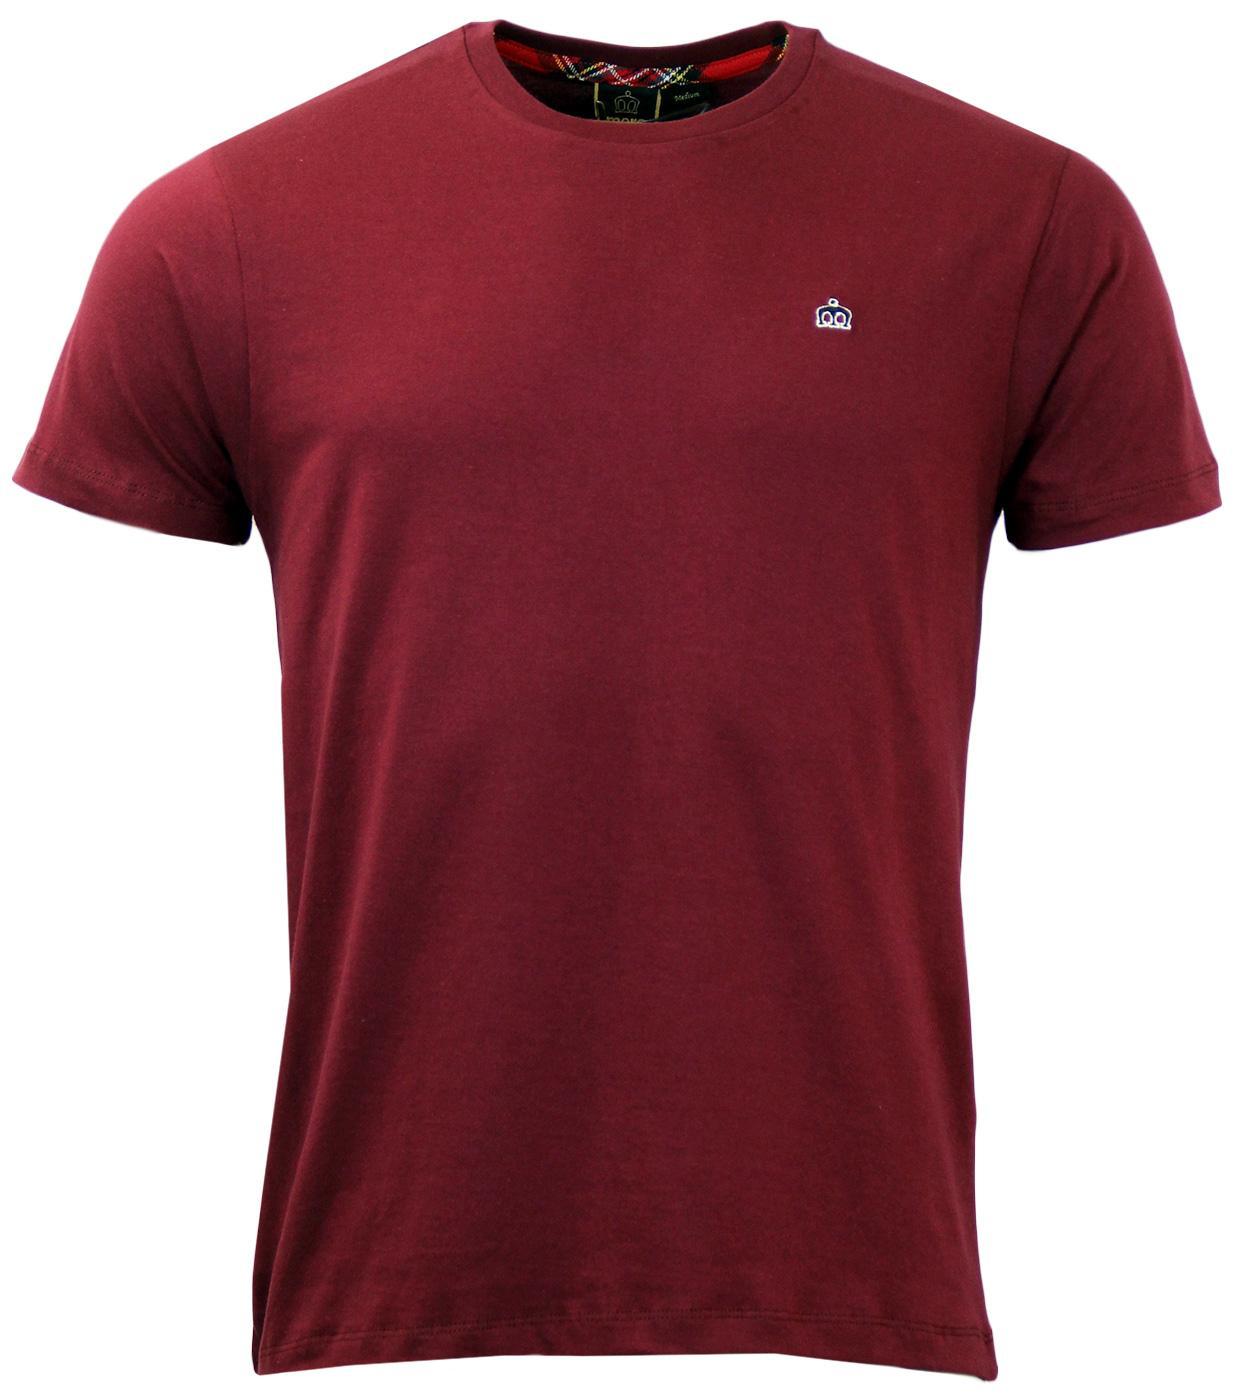 Keyport MERC Retro Mod Plain Crew Neck T-Shirt B